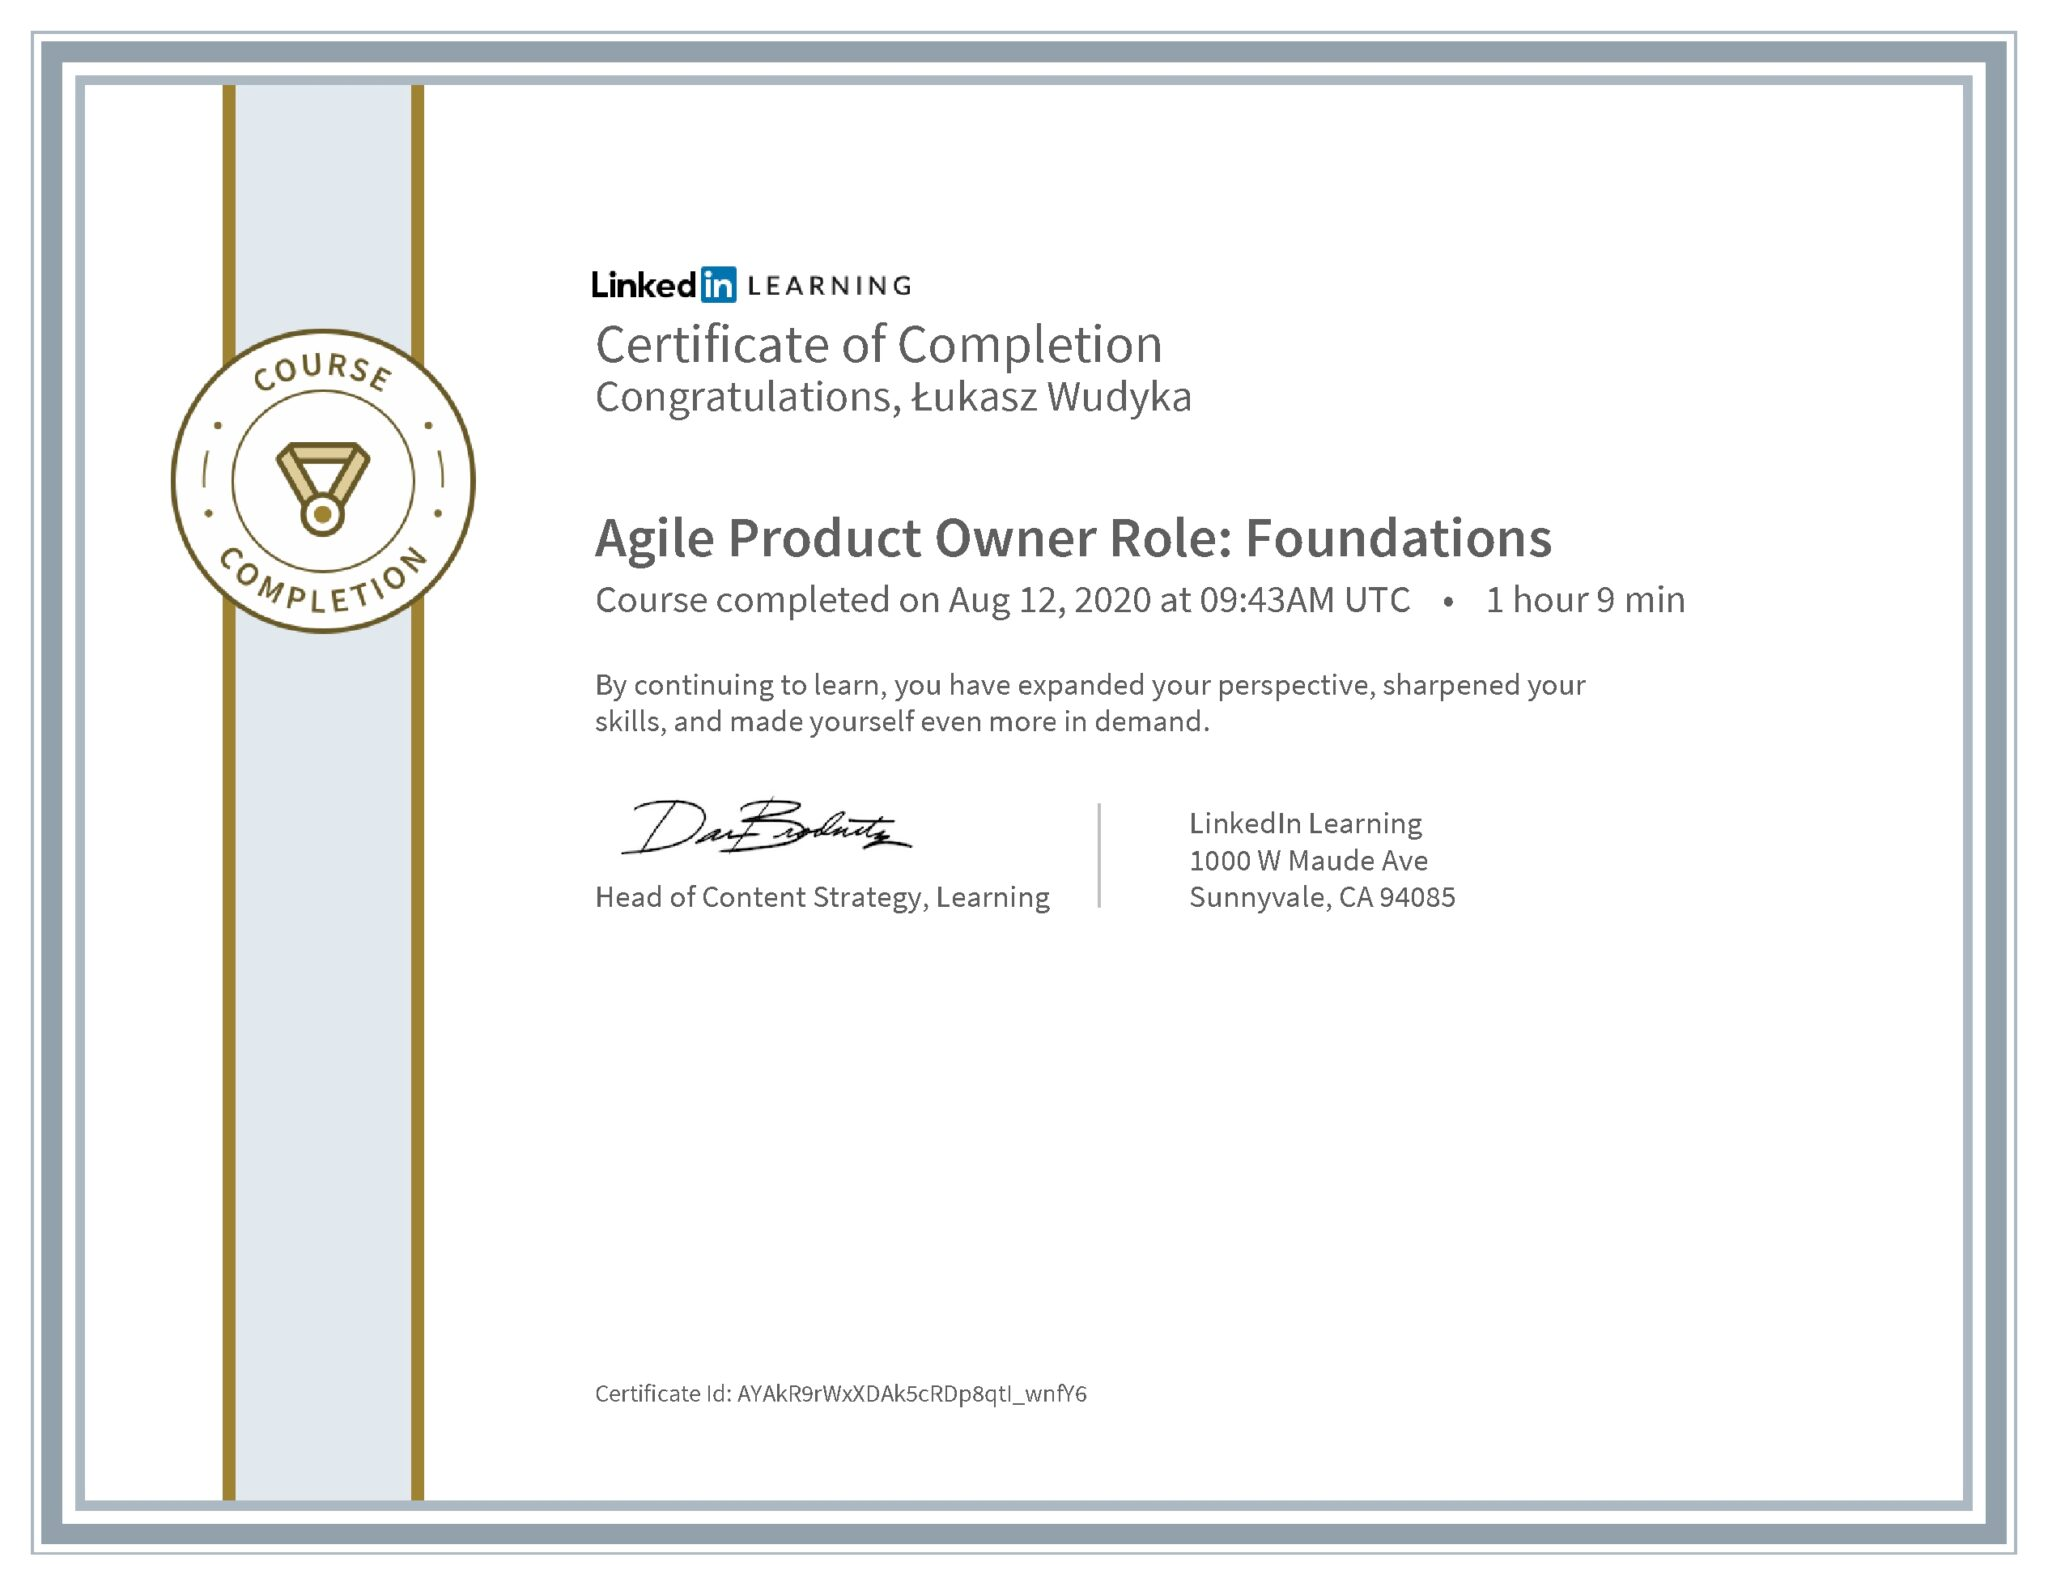 Łukasz Wudyka certyfikat LinkedIn Agile Product Owner Role: Foundations